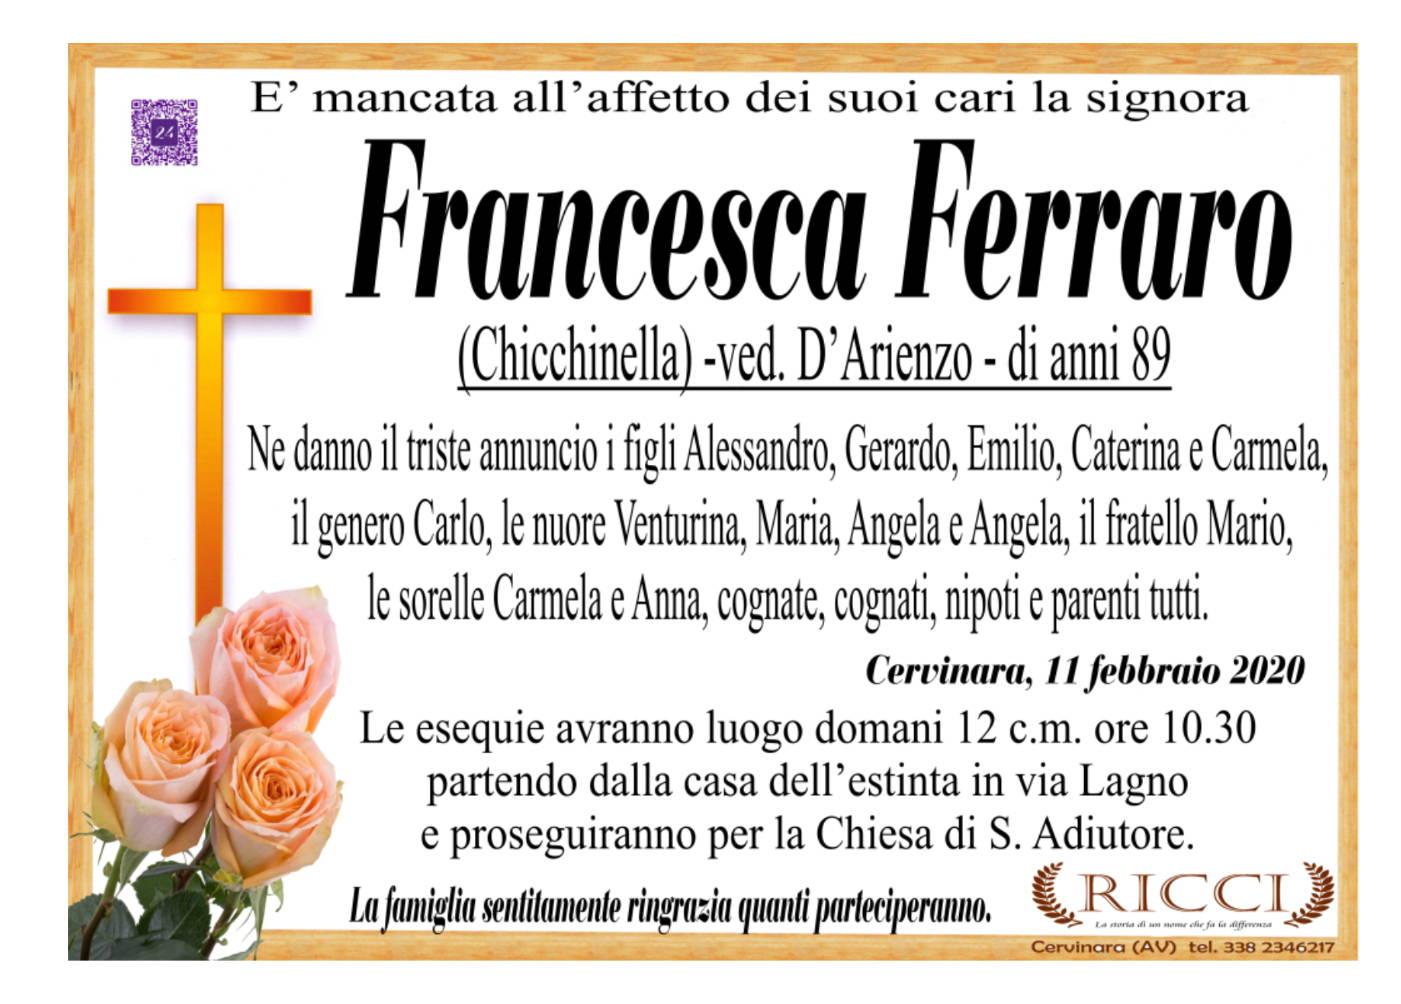 Francesca Ferraro